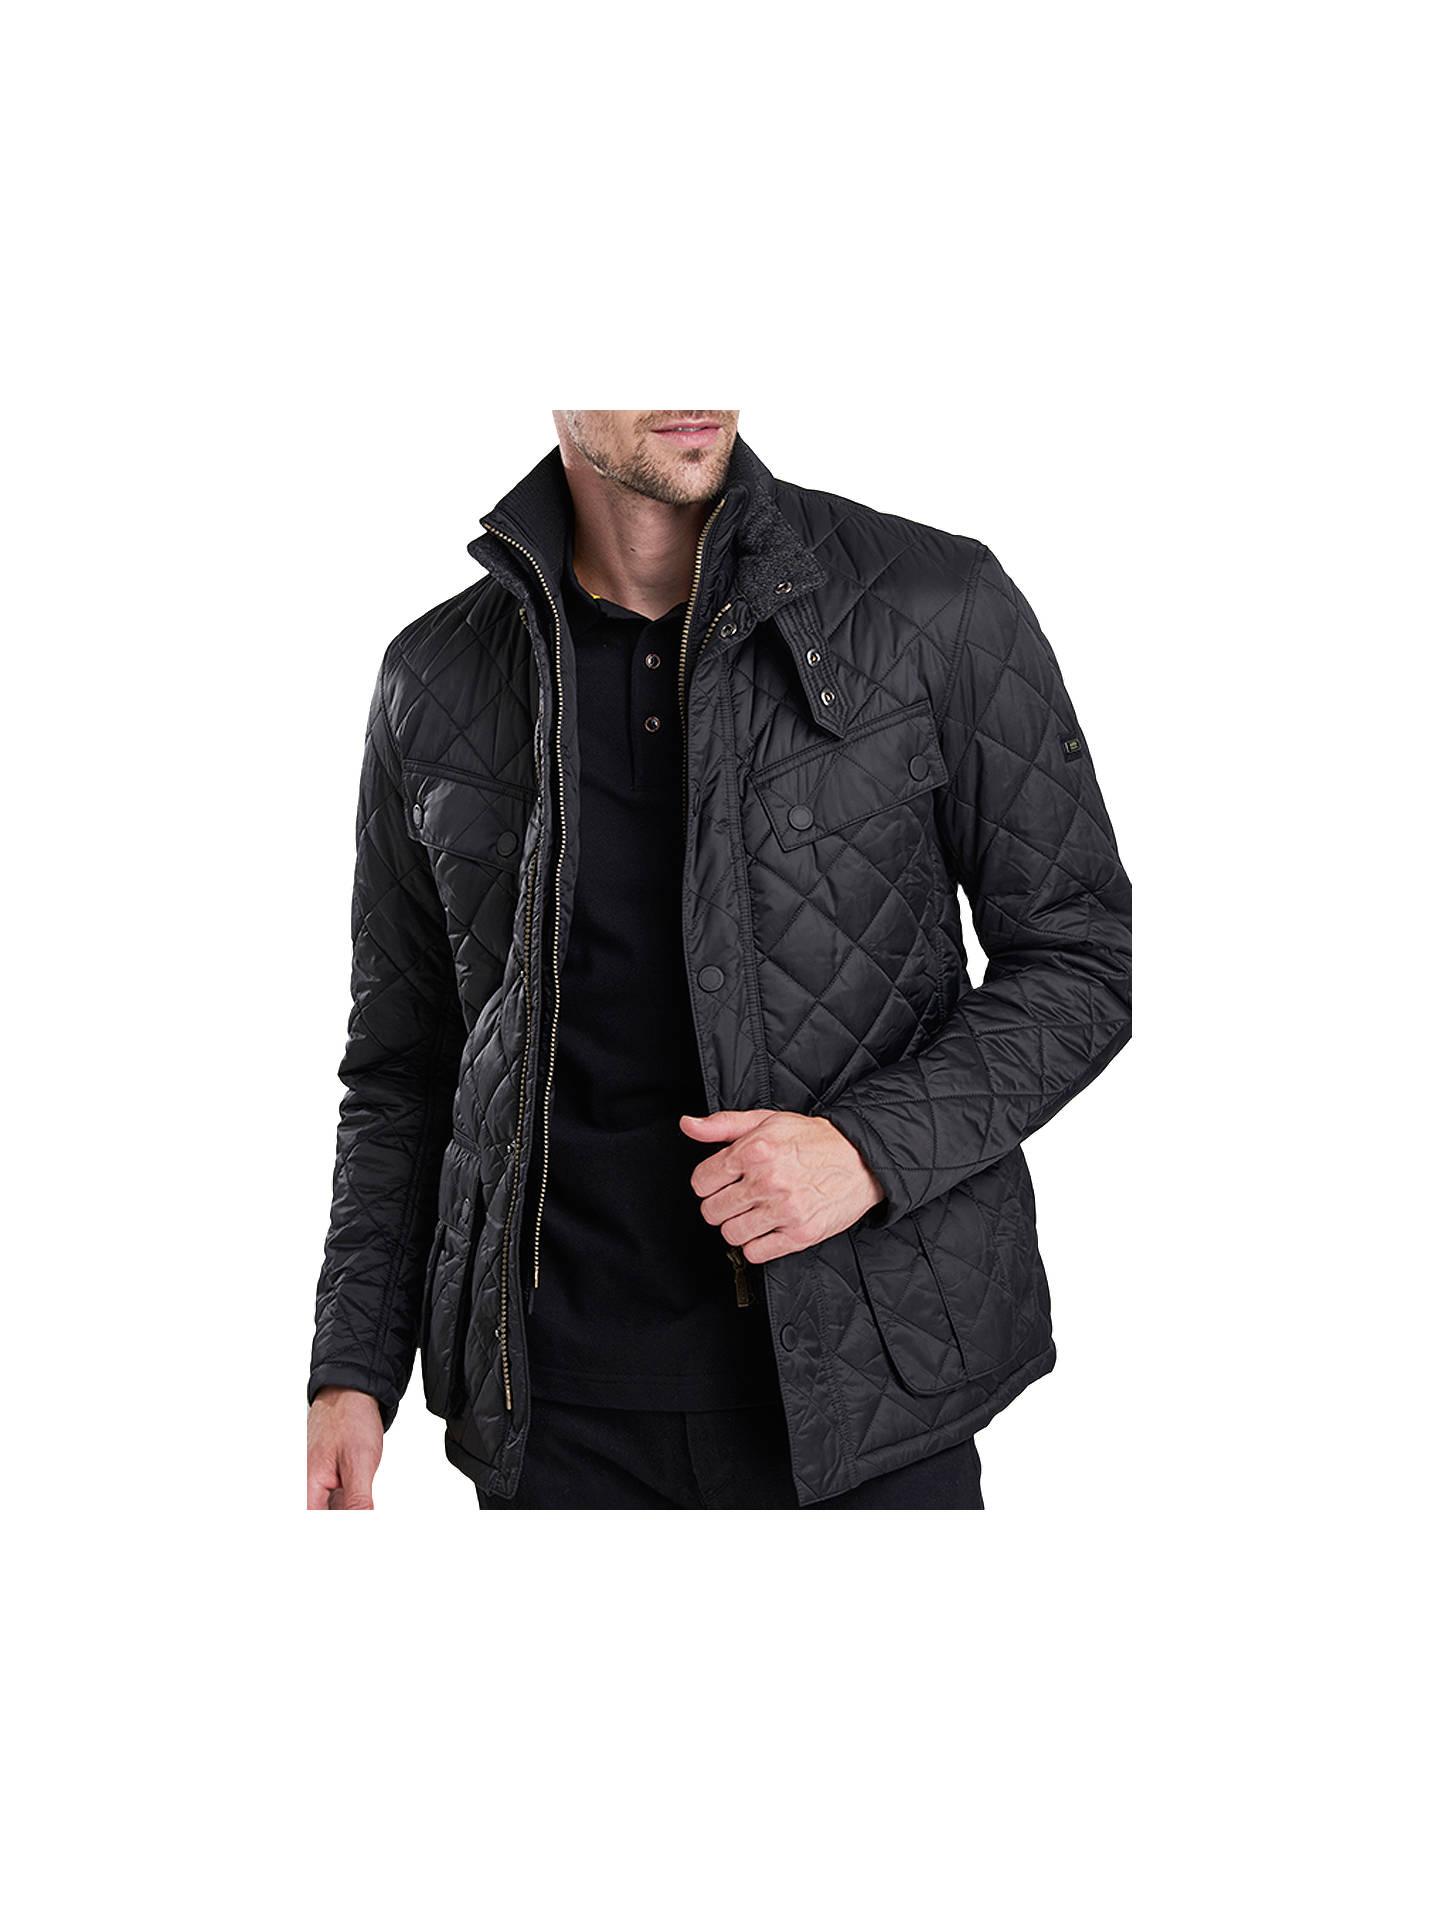 Barbour International Quilted Windshield Jacket Black At